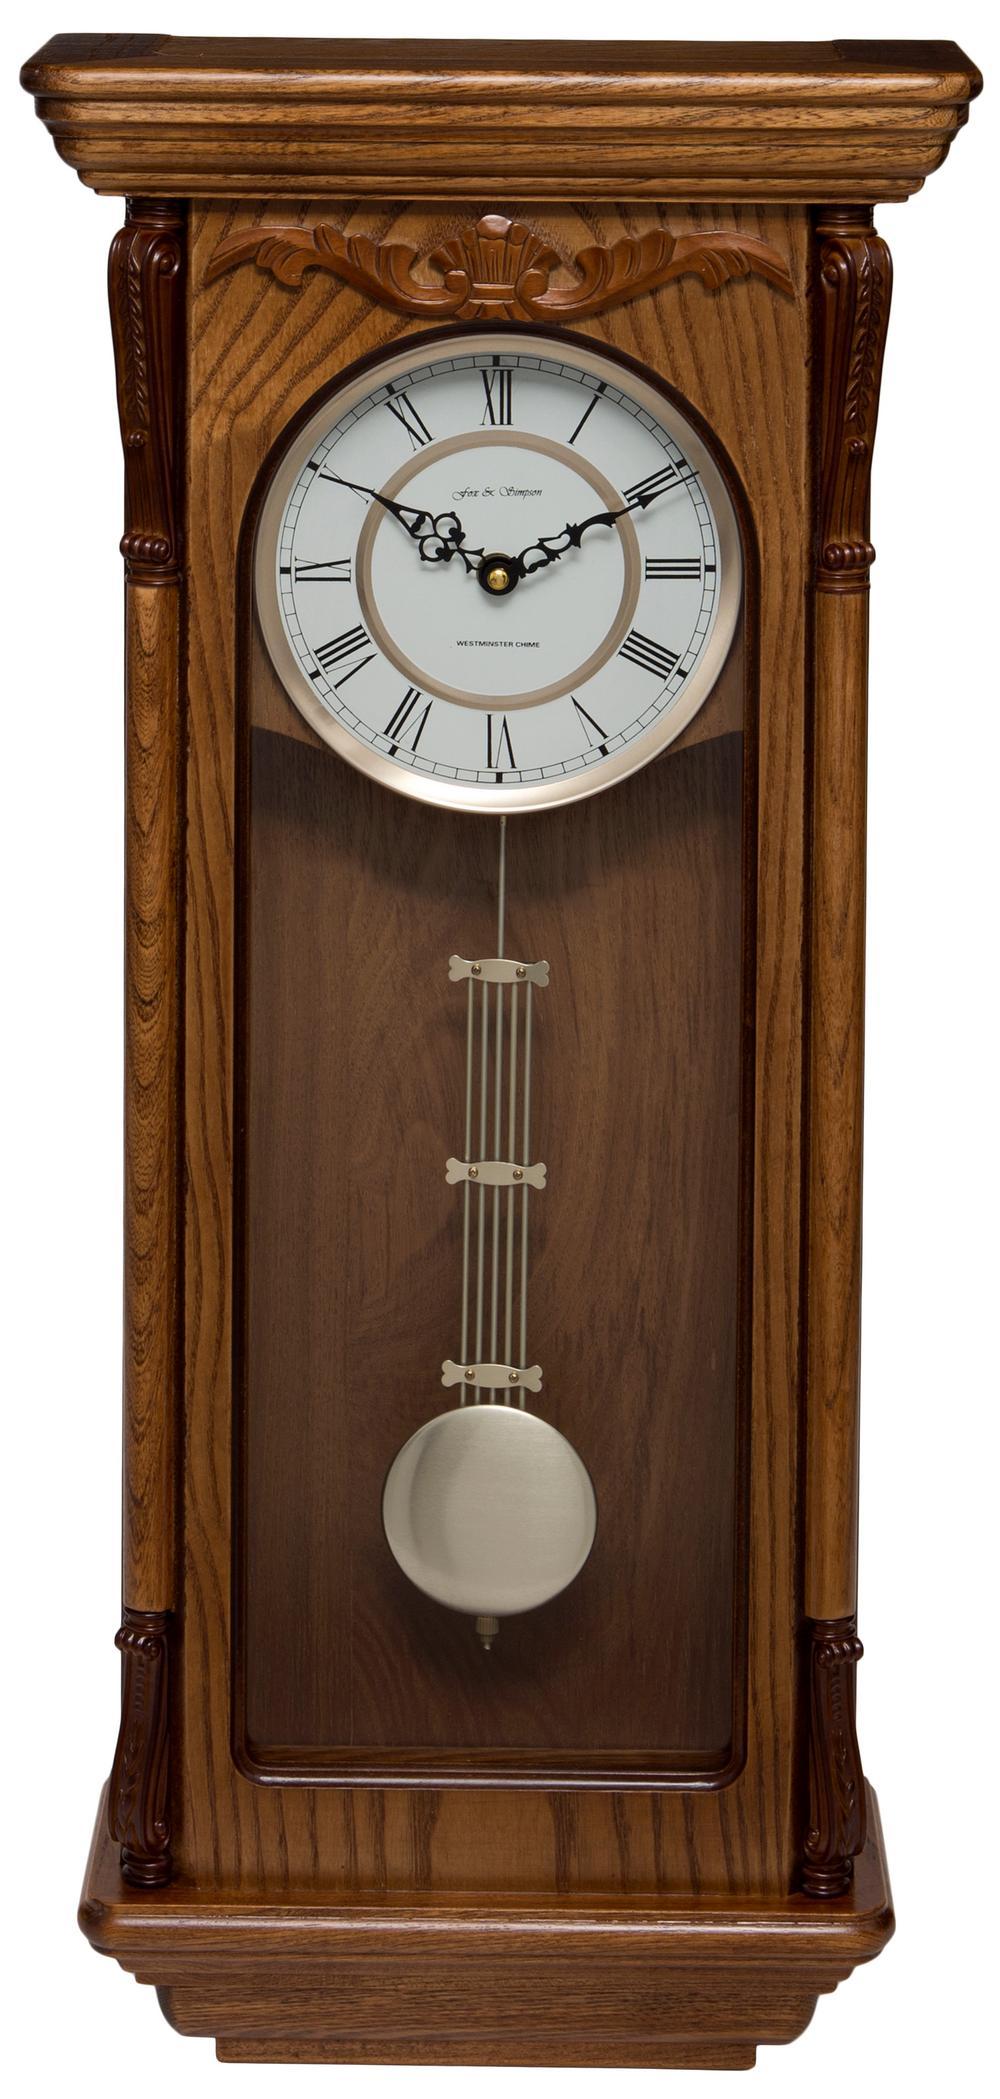 Aldersbrook Oak Pendulum Clock with Westminster Chimes